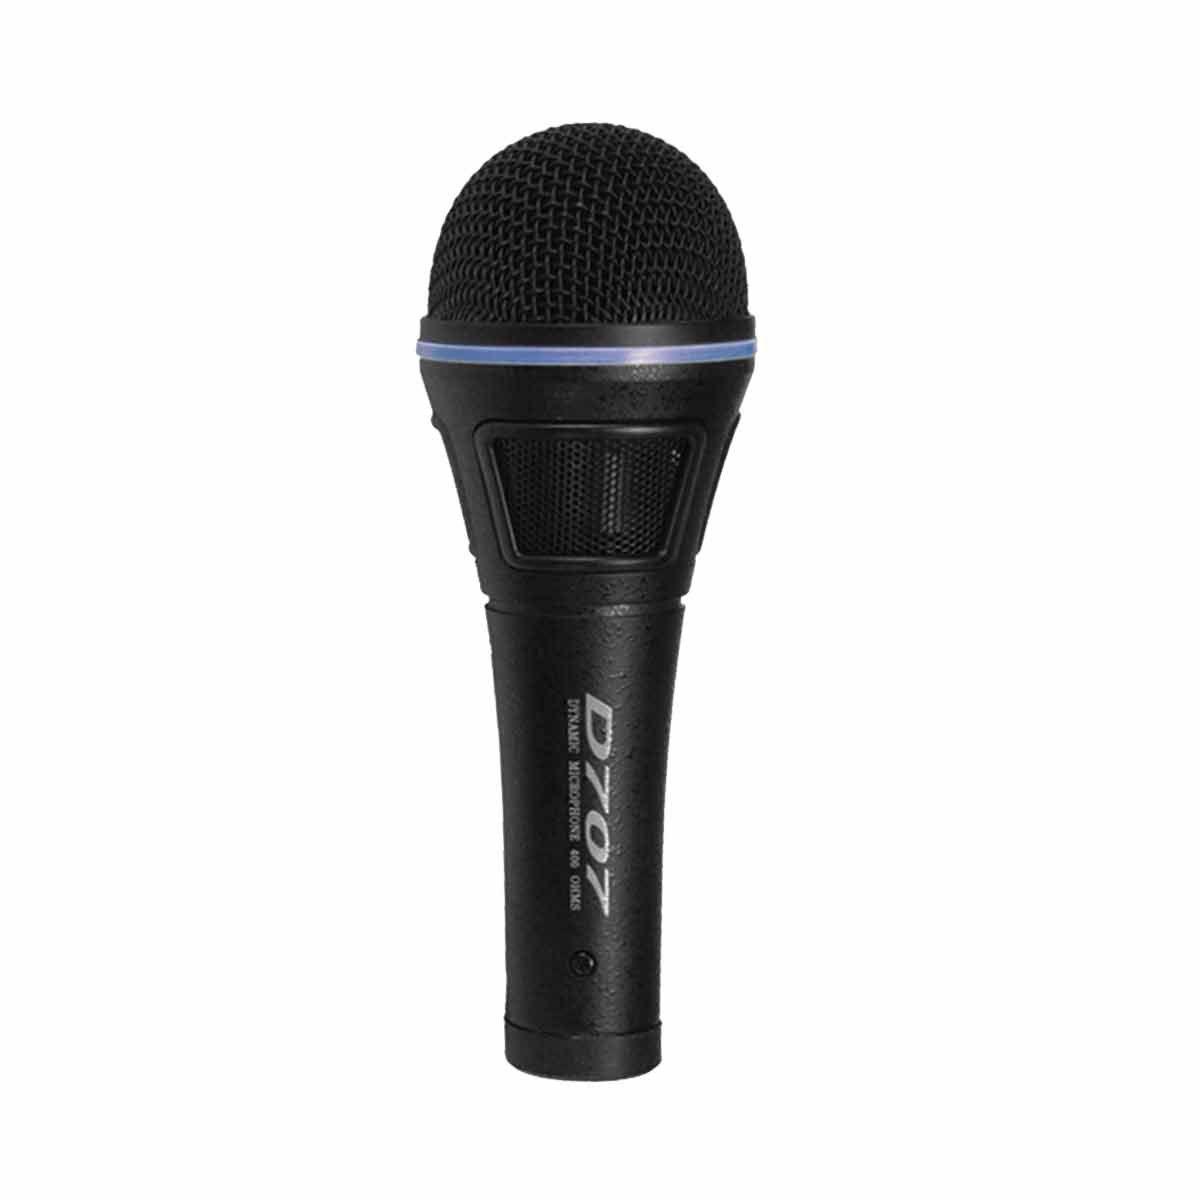 Microfone c/ Fio Dinâmico p/ Instrumentos - D 707 Yoga